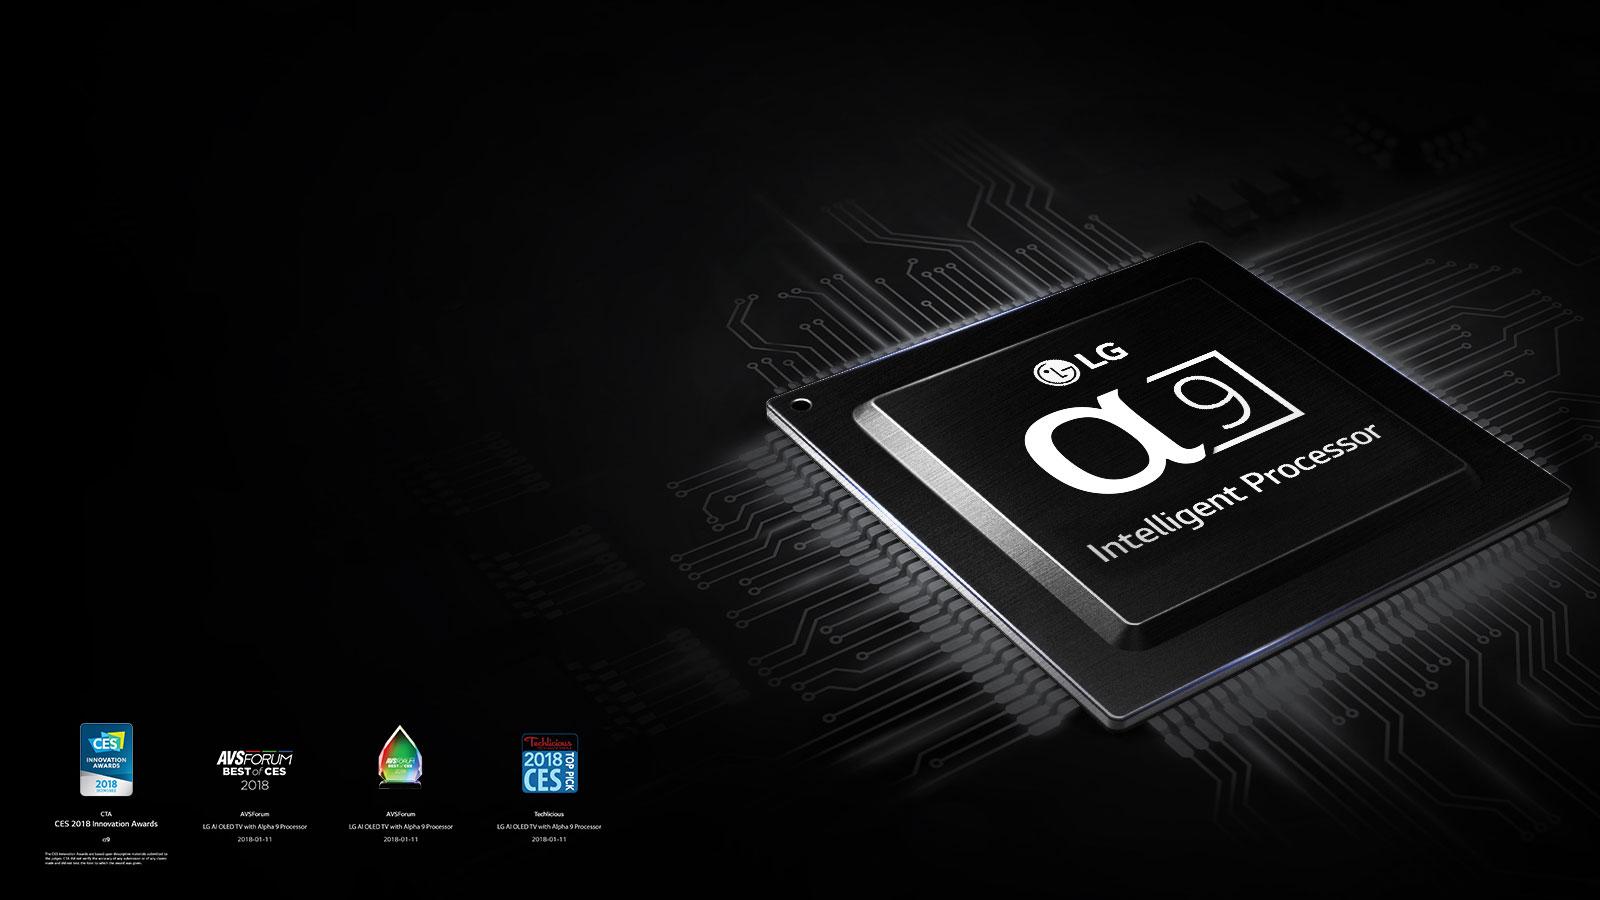 LG OLED TV With α9 Intelligent Processor